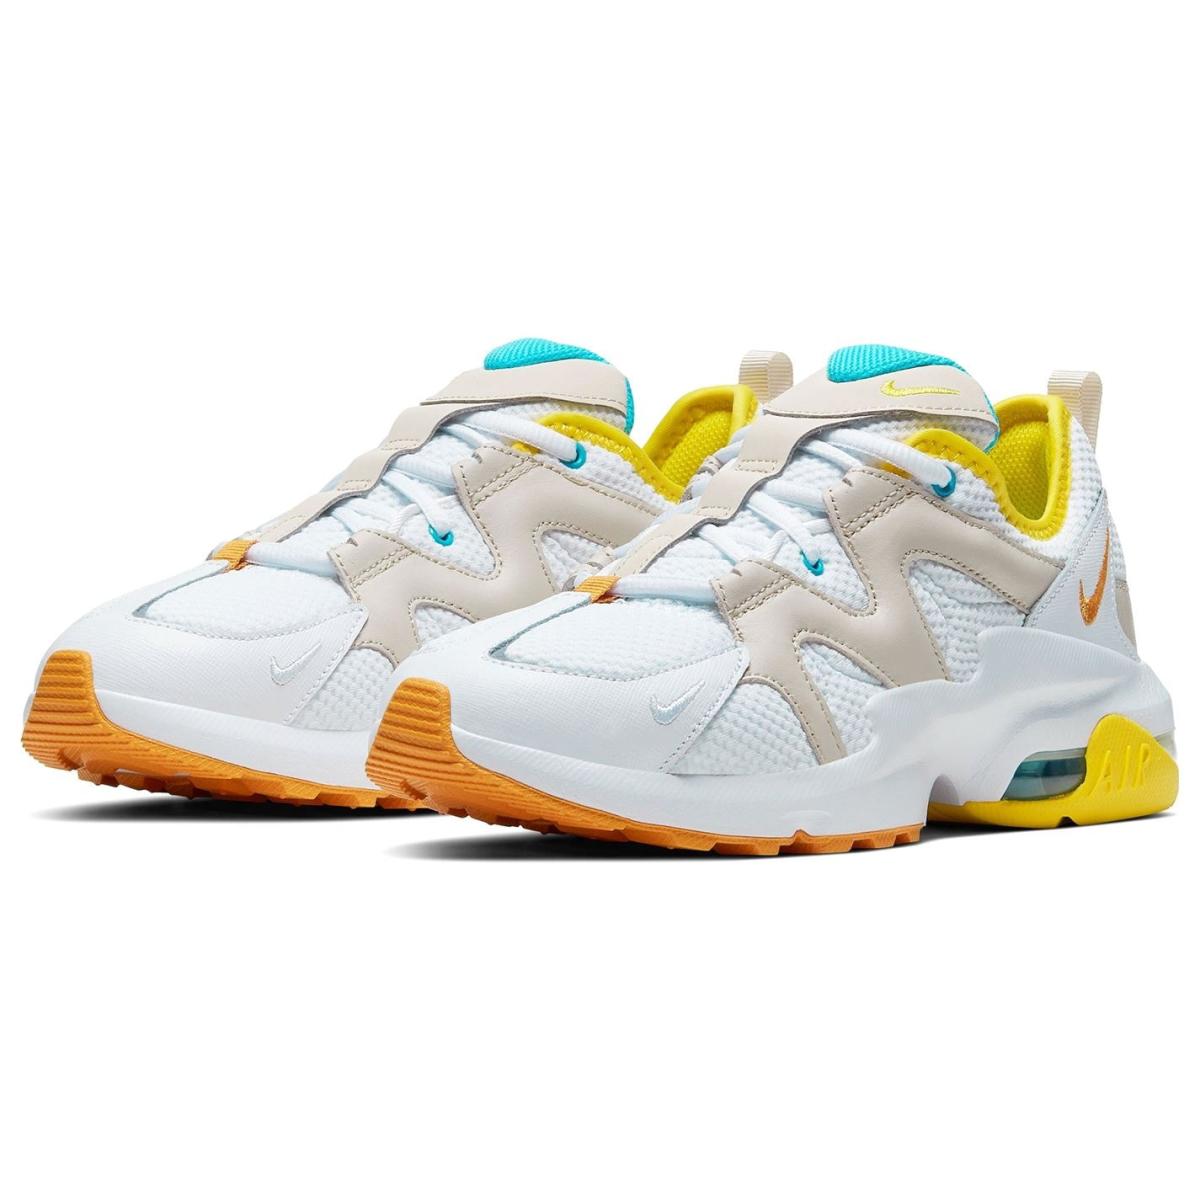 Nike Air Max Graviton Turnschuhe Damen Sneaker Sportschuhe Laufschuhe 4069